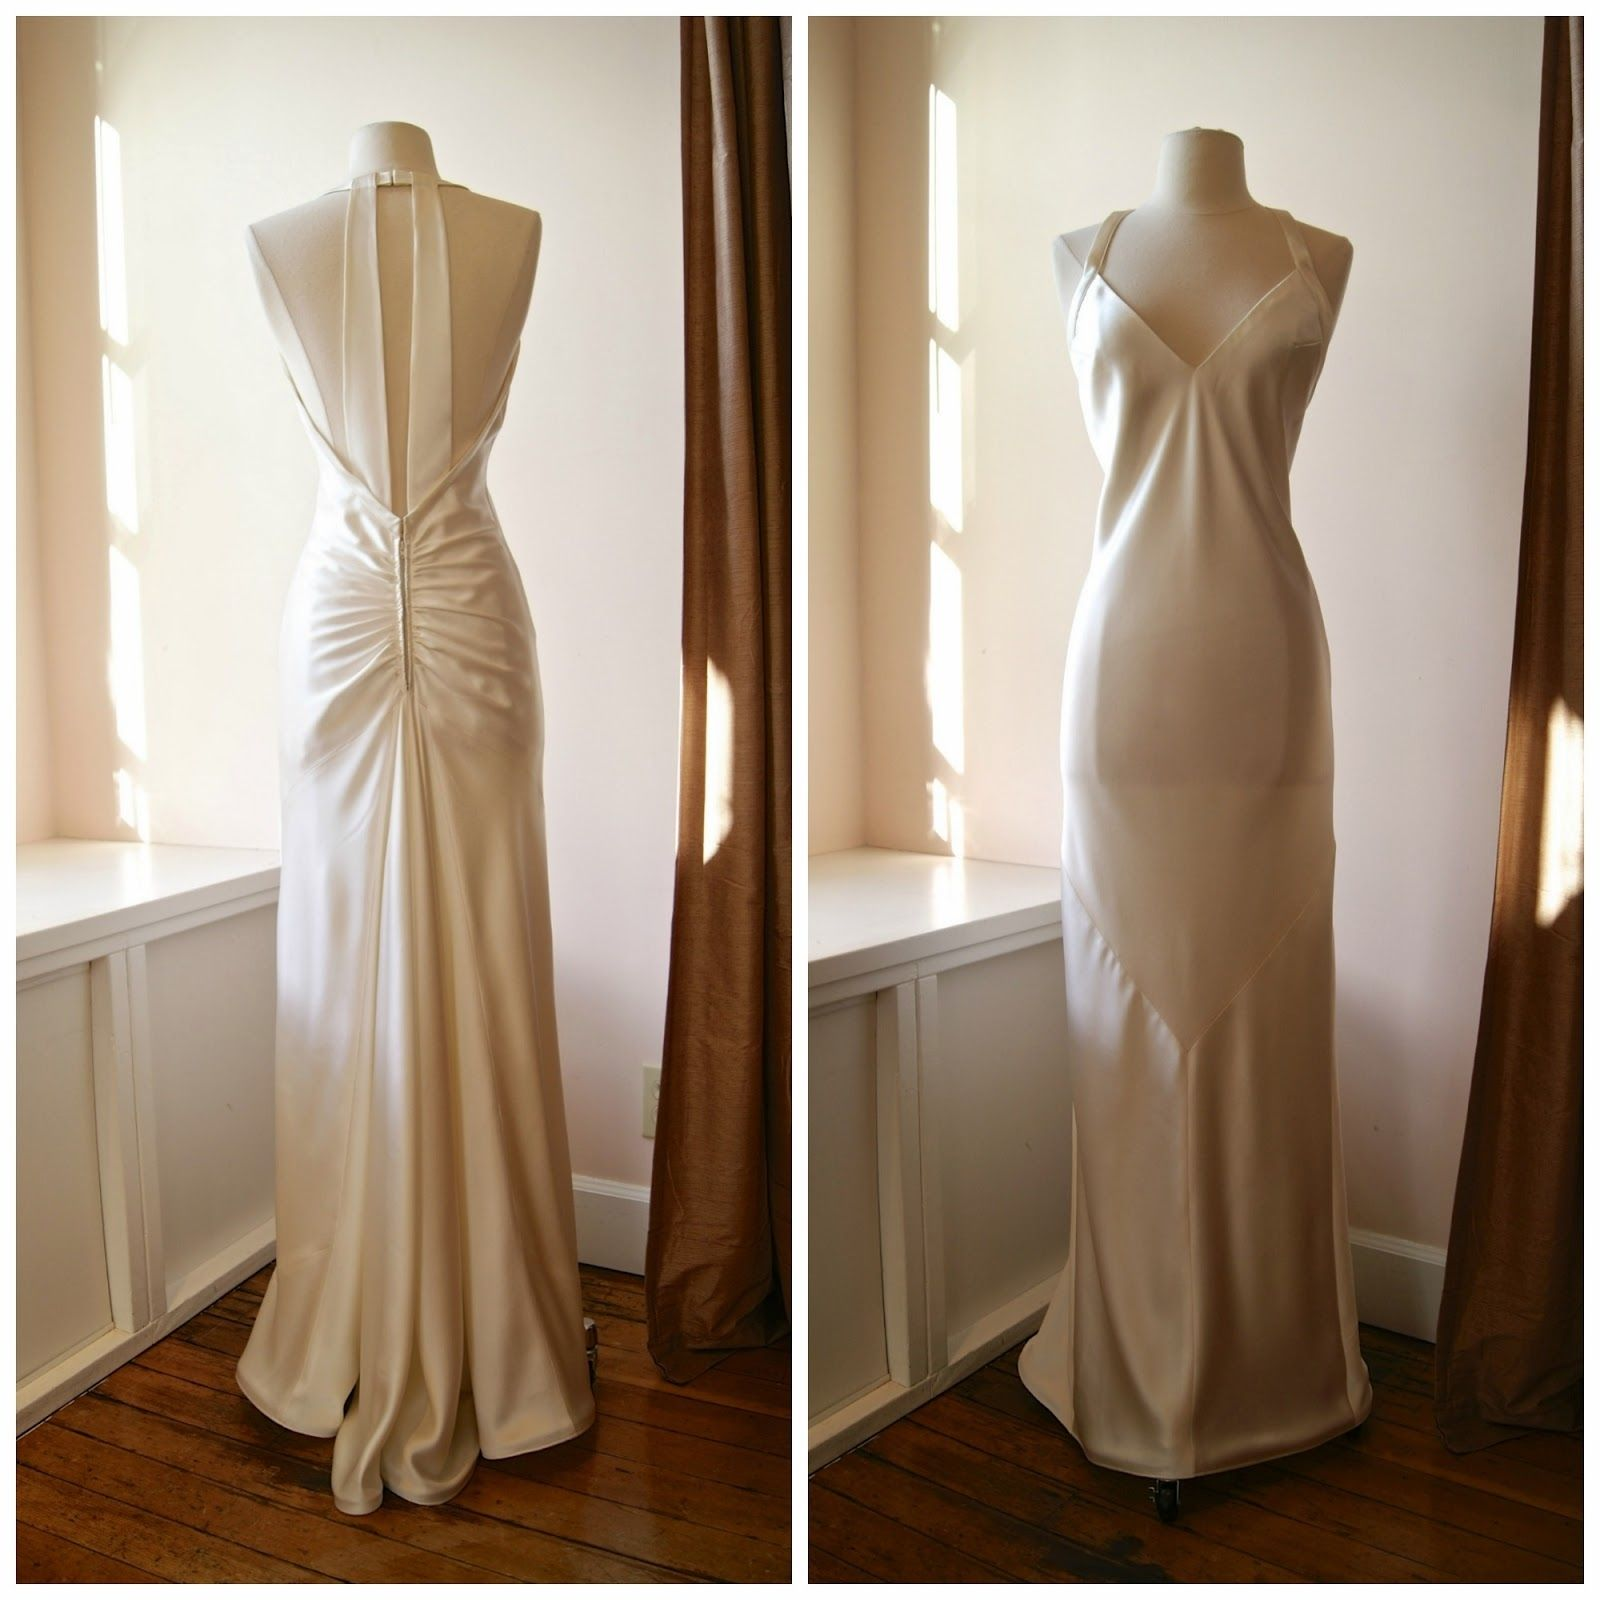 1930 wedding dress  Vintage  Wedding Dress Patterns  Wedding Dress  Pinterest